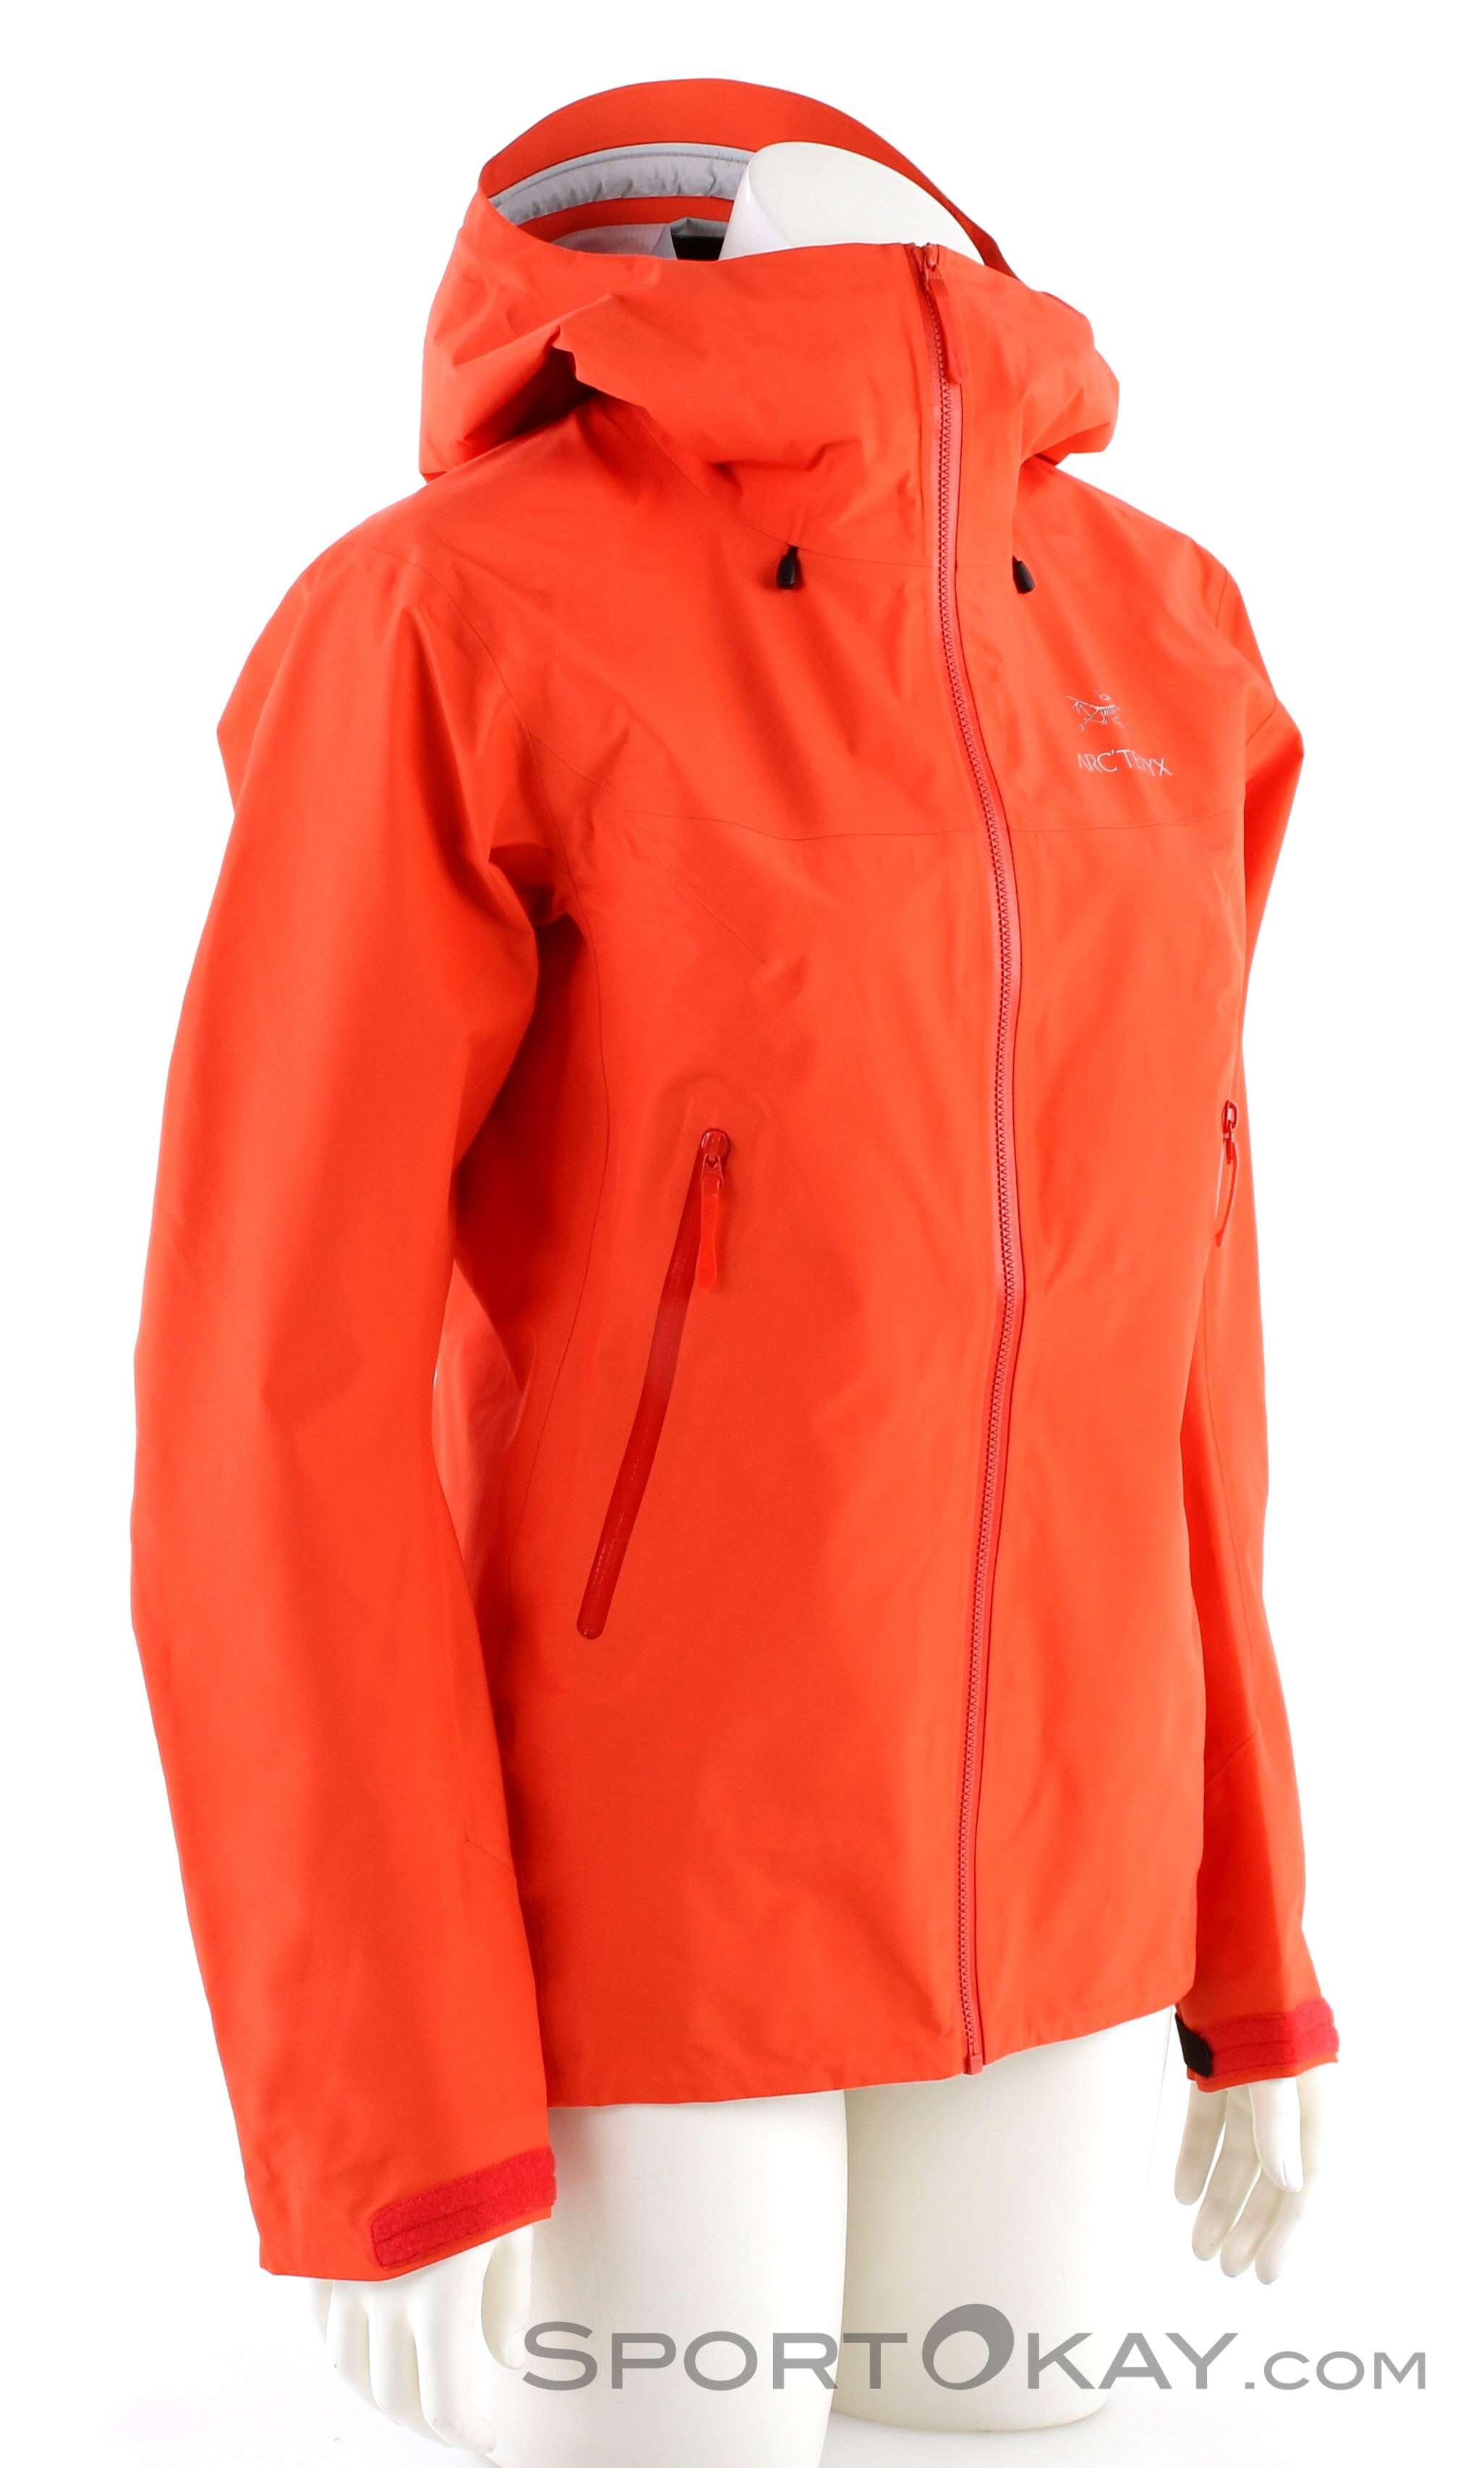 lowest price 94981 6605c Arcteryx Arcteryx Beta LT Jacket Womens Outdoor Jacket Gore-Tex